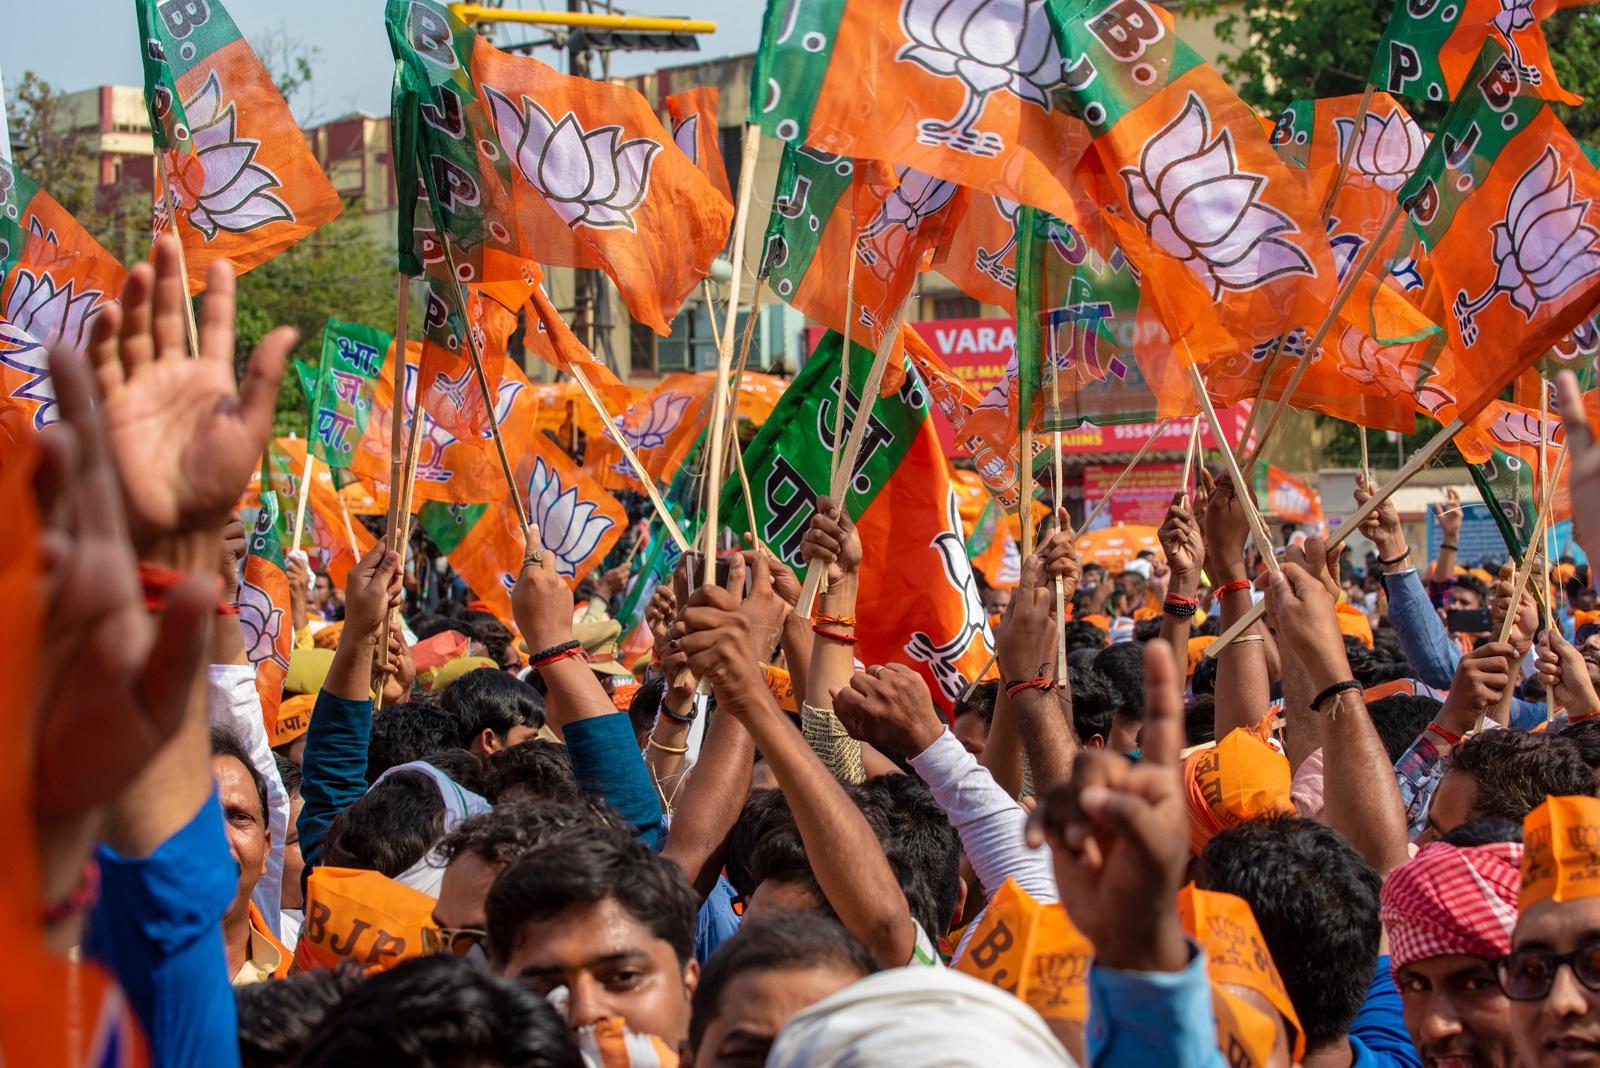 BJP protest in Vadodara over post poll violence incidents in West Bengal